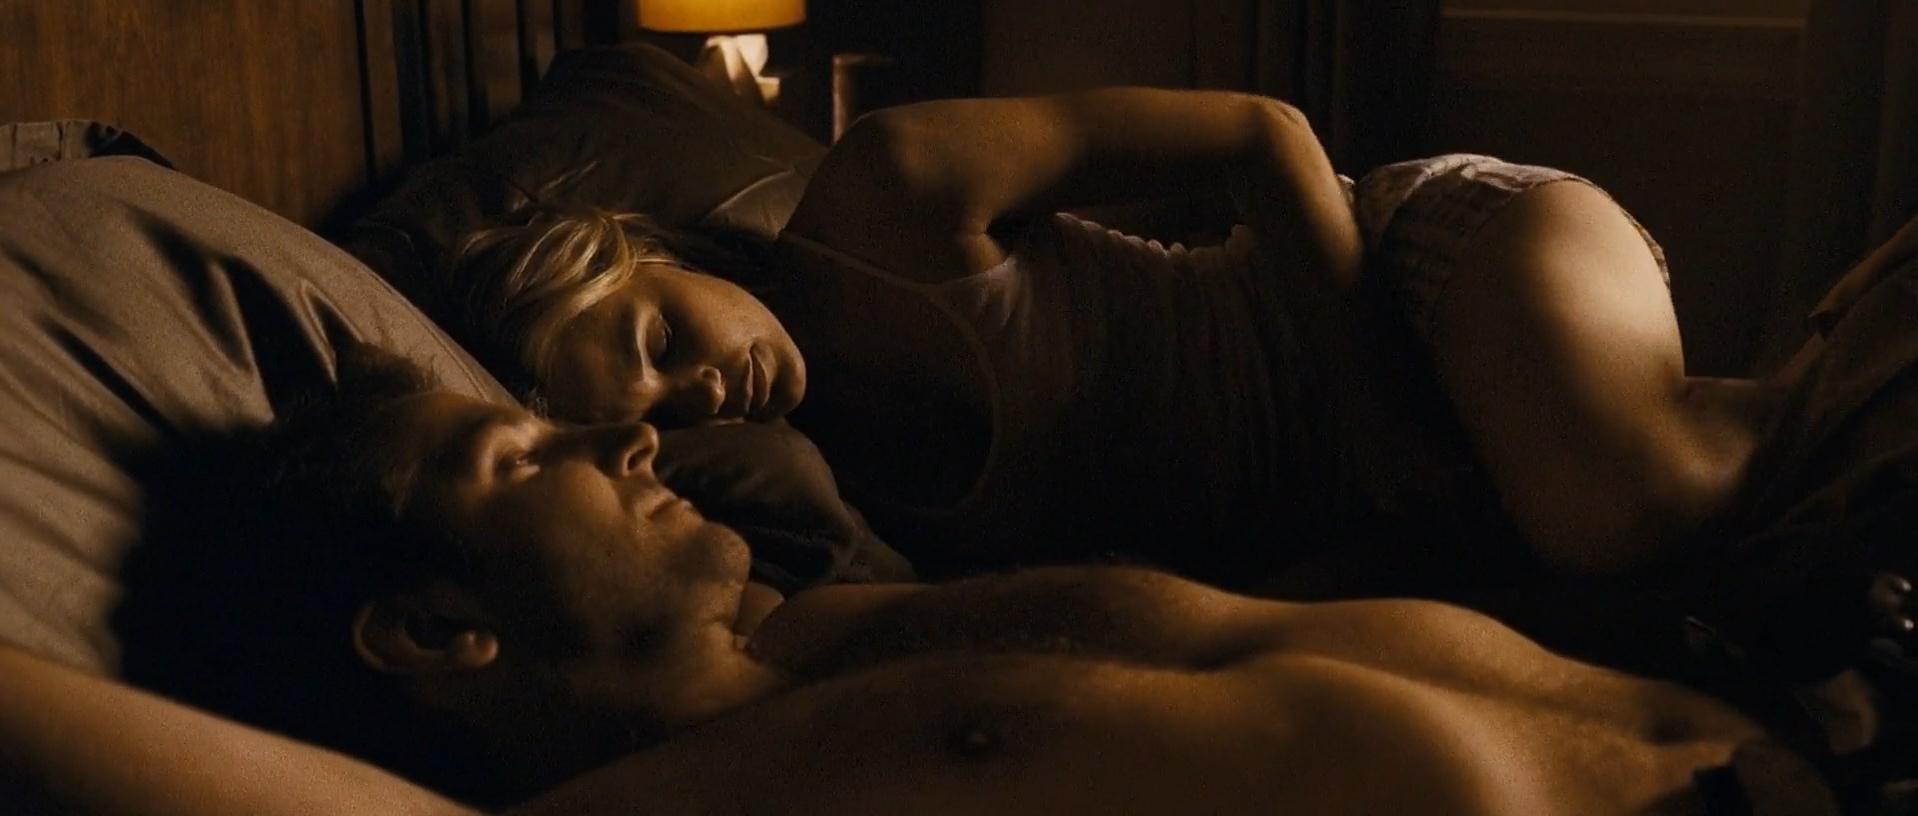 Erotic massage stories 4